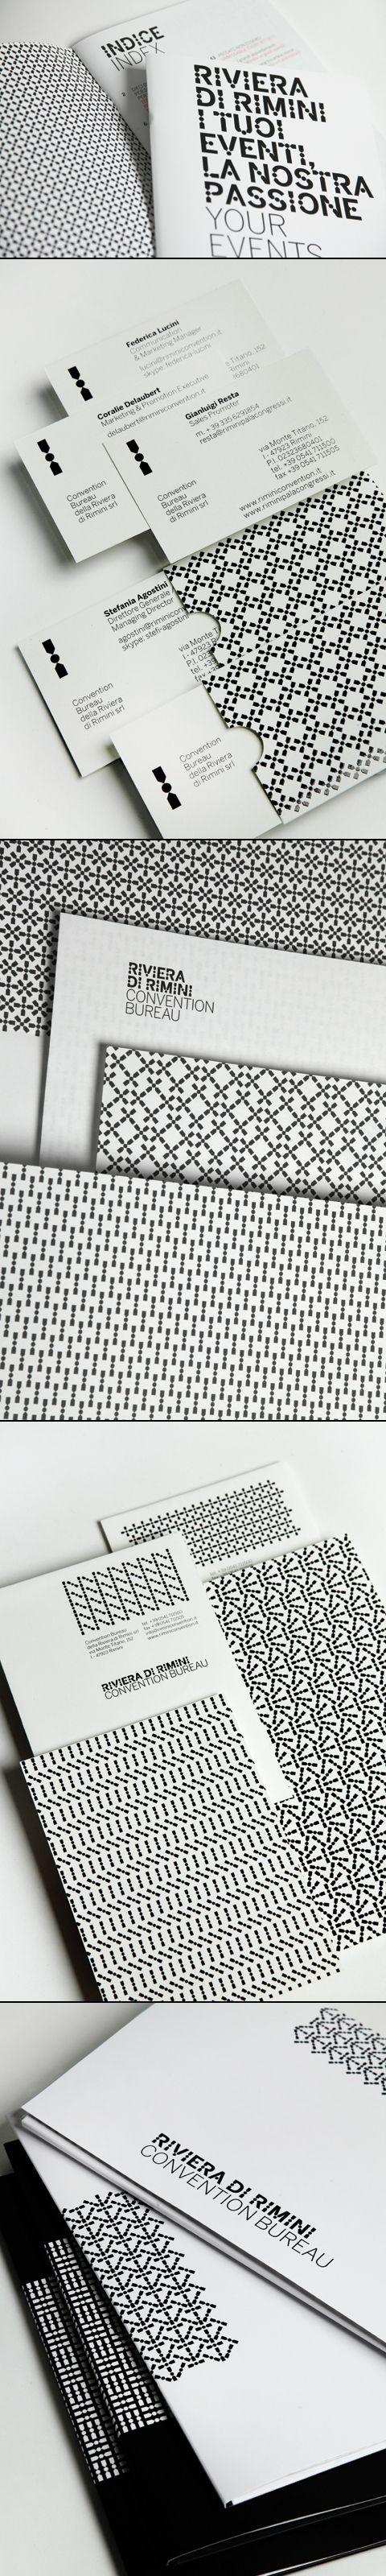 riviera di rimini | #stationary #corporate #design #corporatedesign #identity #branding #marketing < repinned by www.BlickeDeeler.de | Take a look at www.LogoGestaltung-Hamburg.de